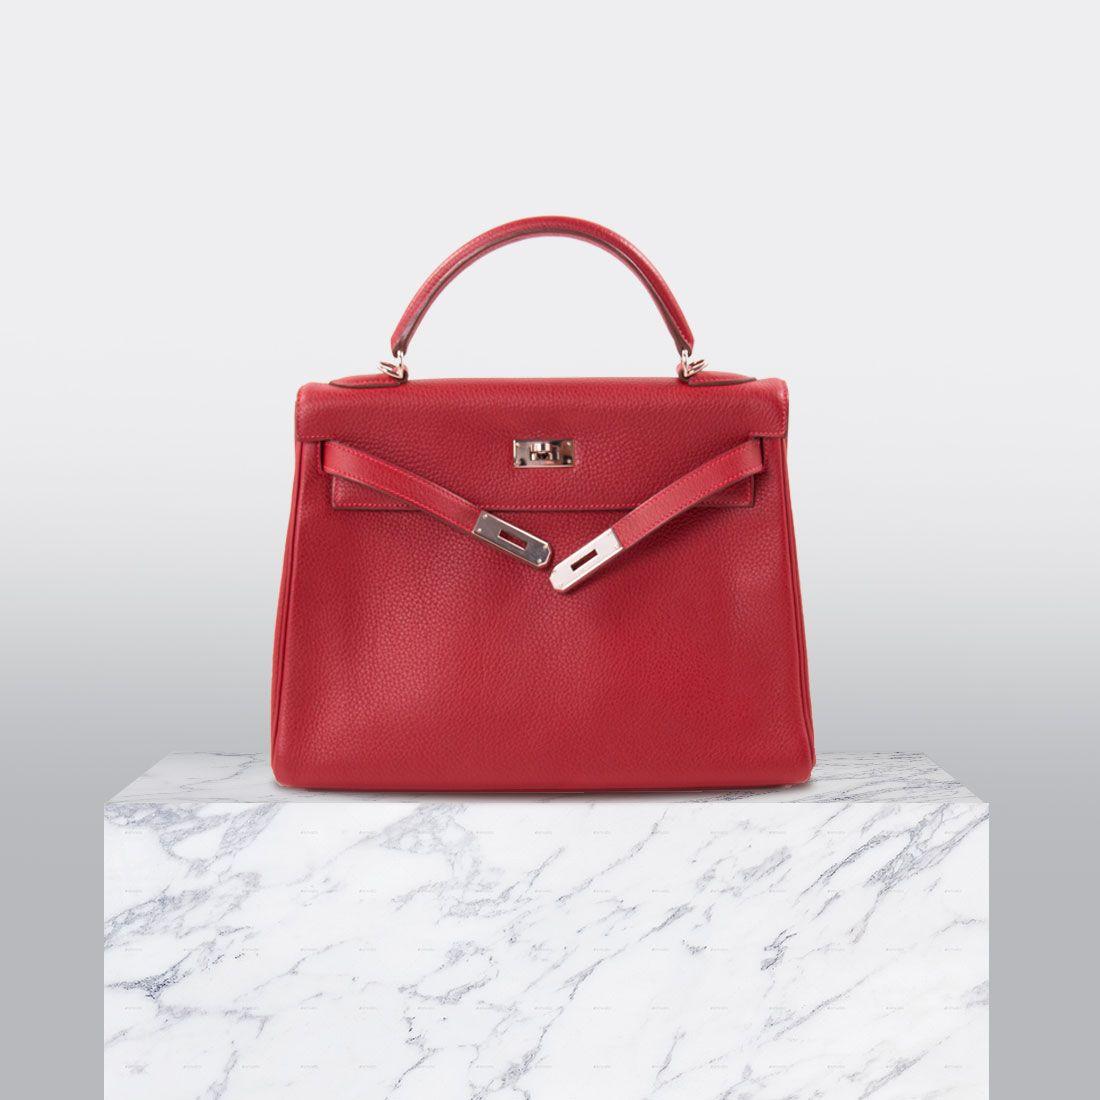 7d81b840f198 Shop authentic Hermès Kelly 32 Rouge Casaque Clemence at revogue for ...